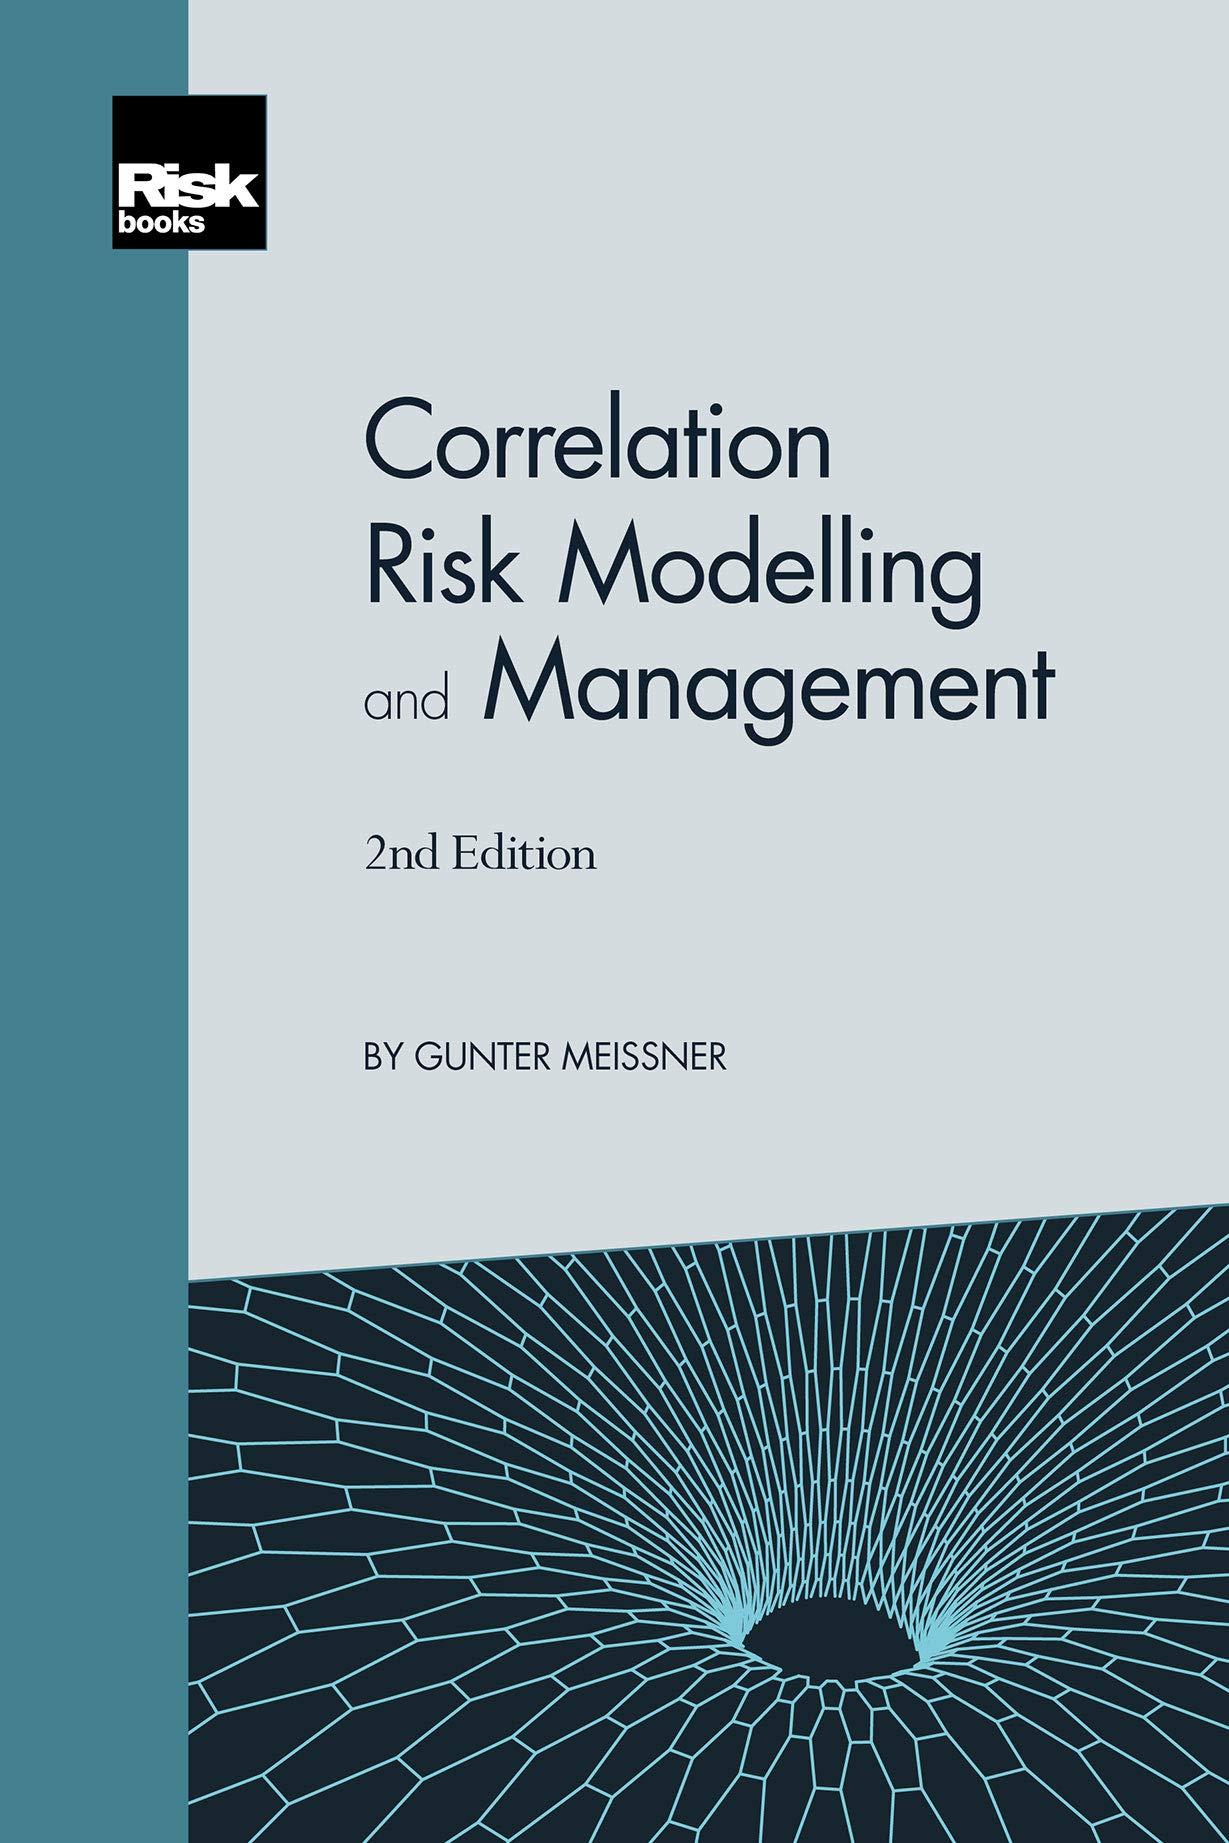 Correlation Risk Modelling and Management